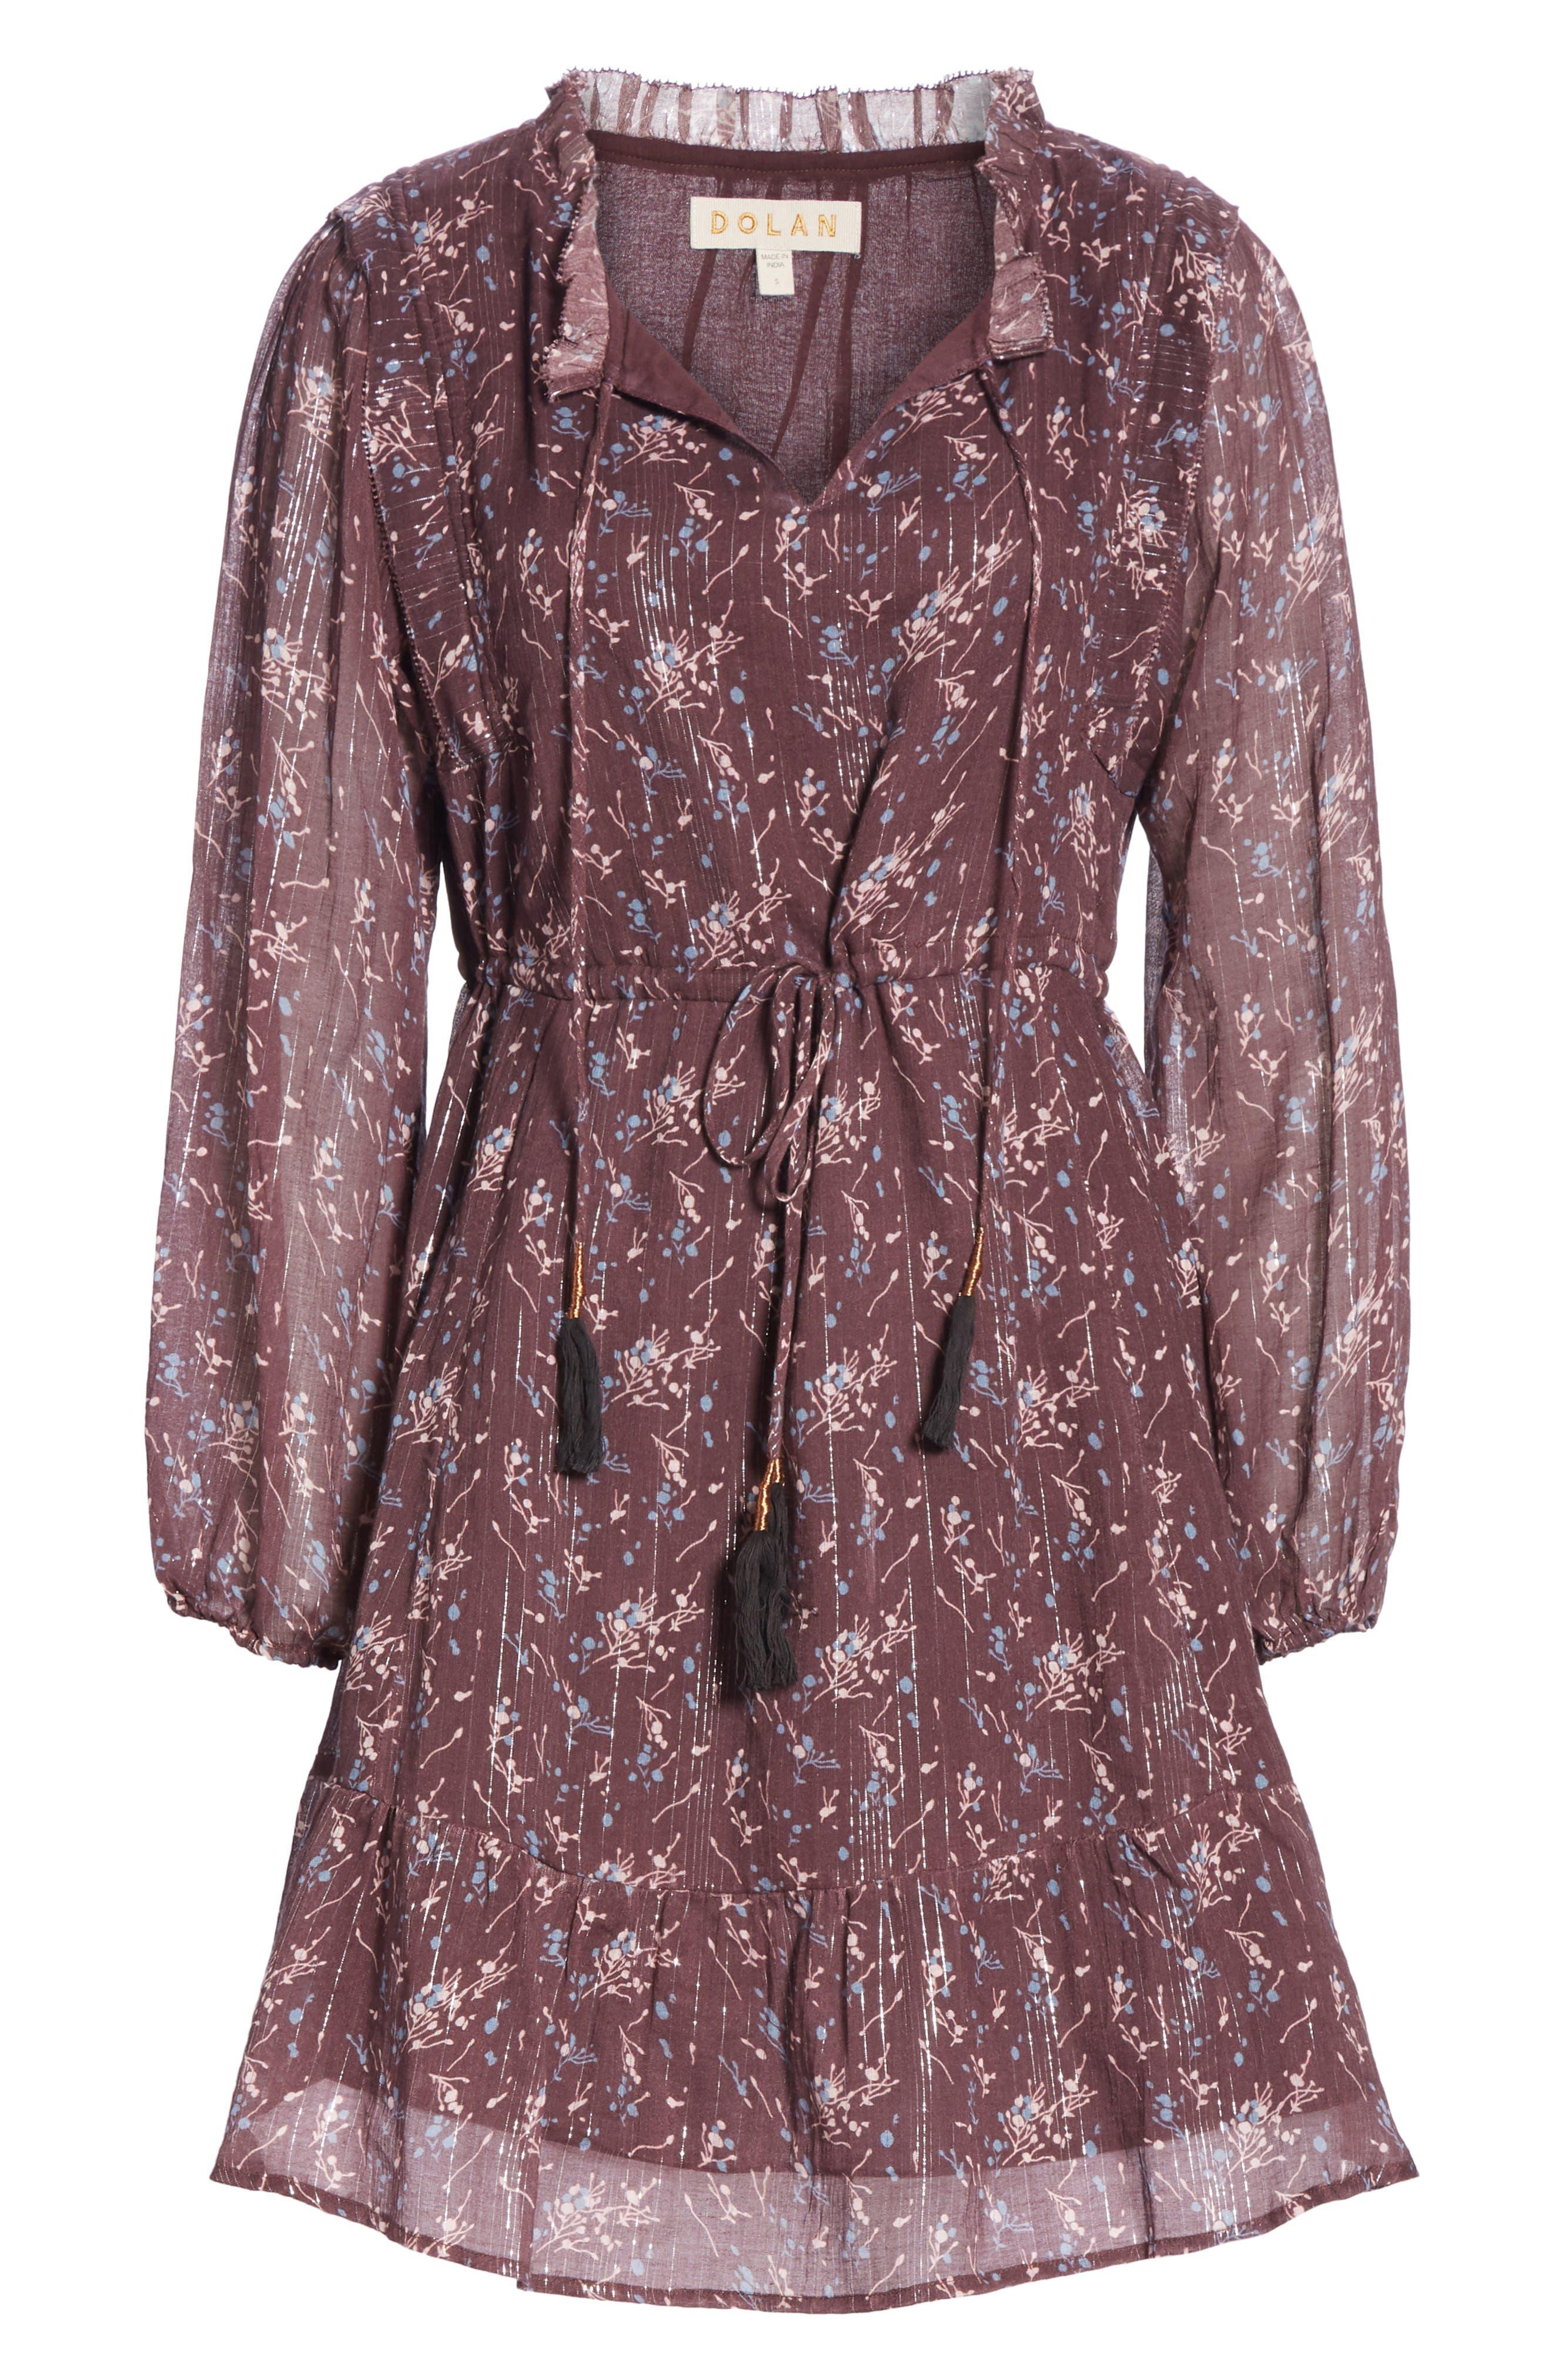 Ruffled Drawstring Waist Dress,                             Alternate thumbnail 8, color,                             BROWN PLUM BLOSSOM